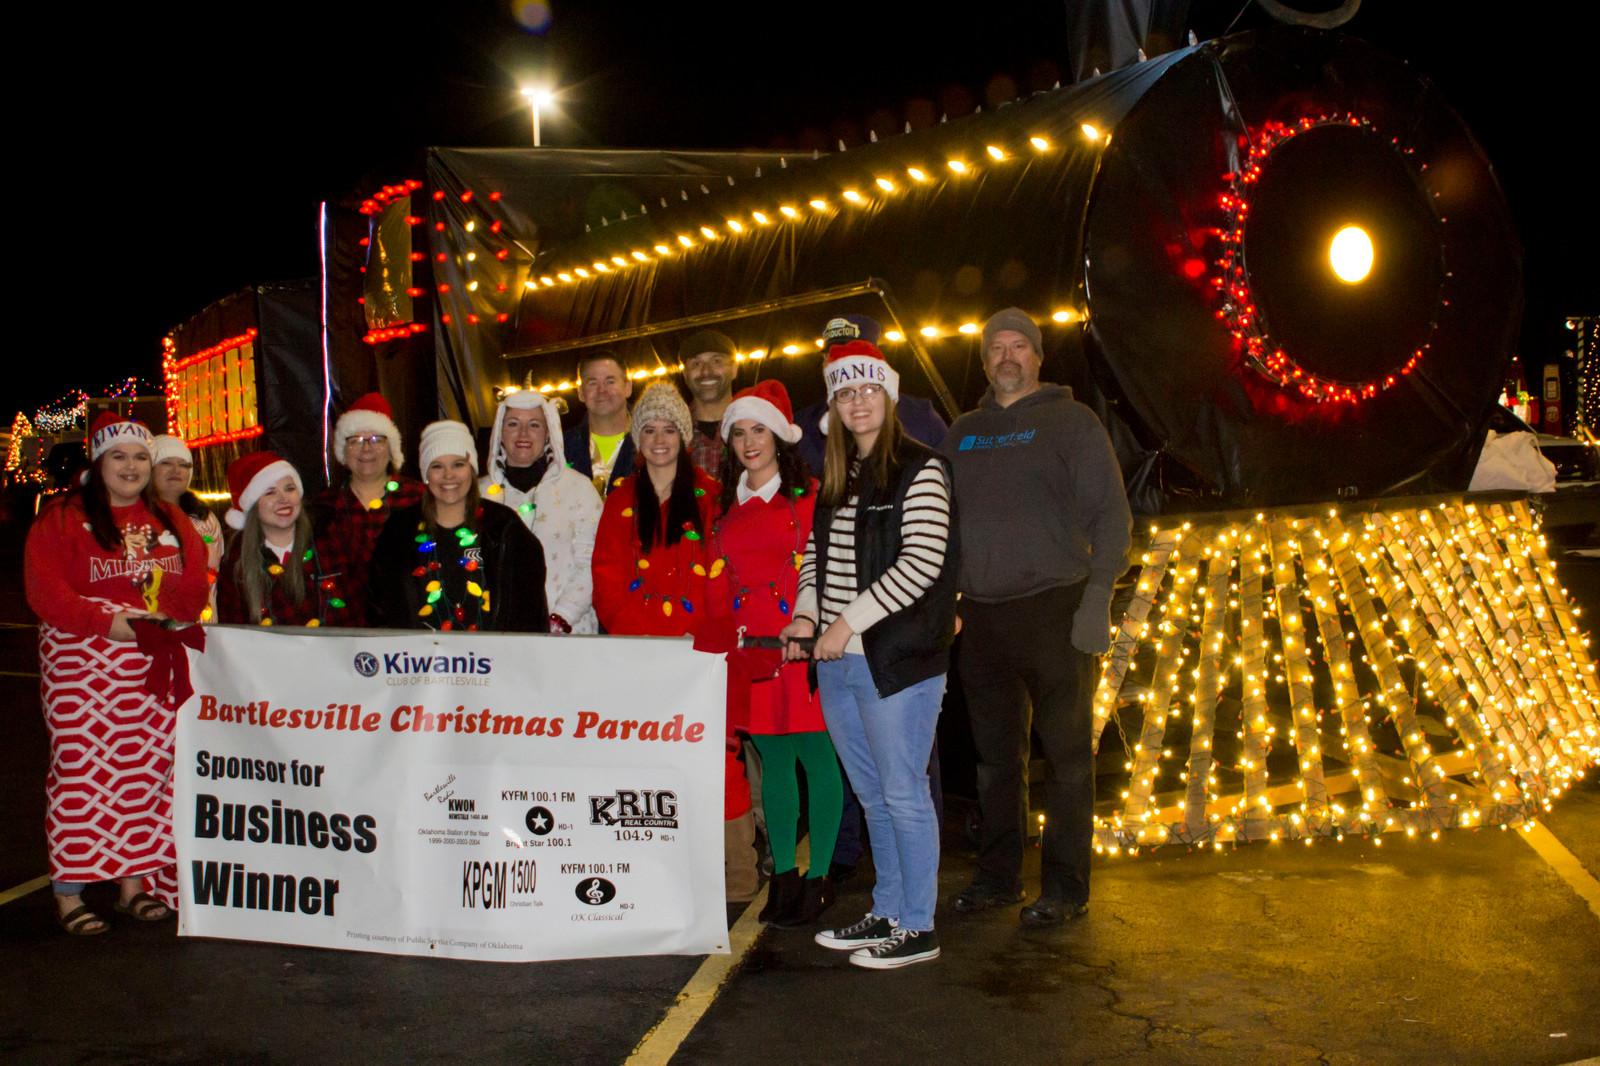 Bartlesville Christmas Parade 2019 IMG_8188.